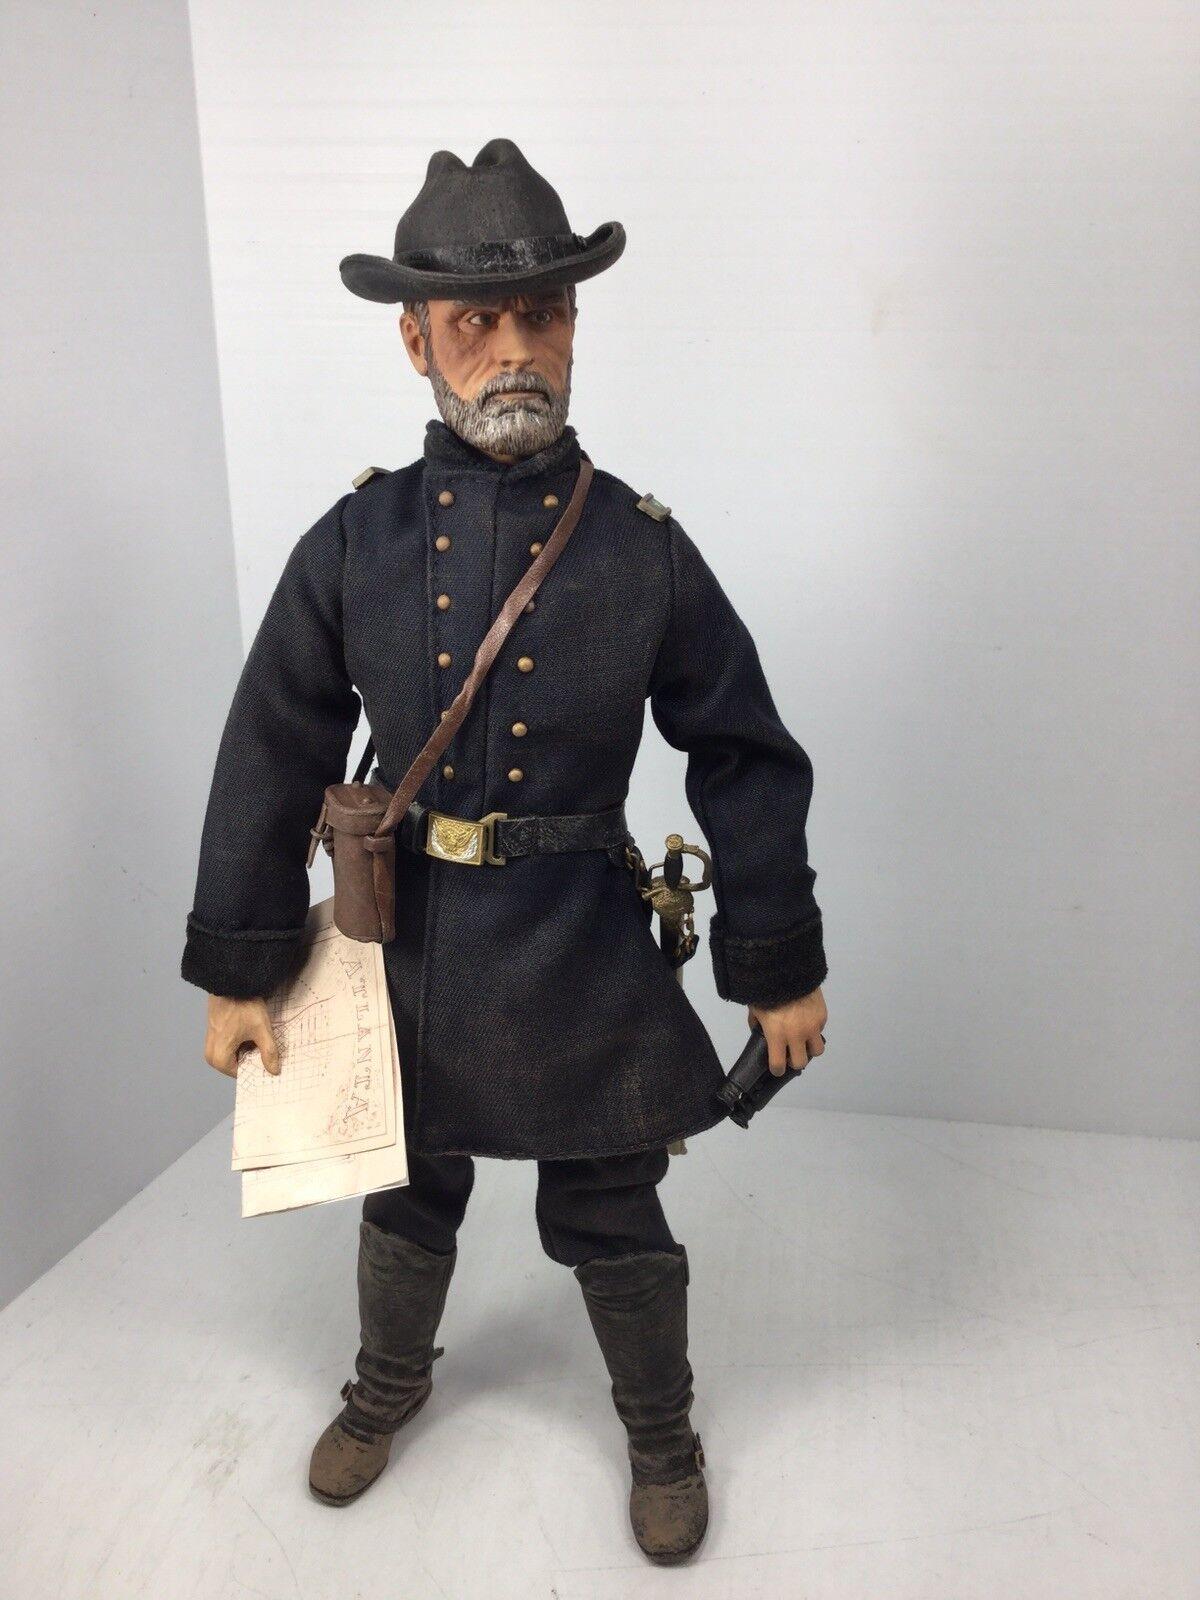 1 6 Sideshow Unión Civil War Maj GEN William Tecumseh Sherman Dragon Bbi hizo 21